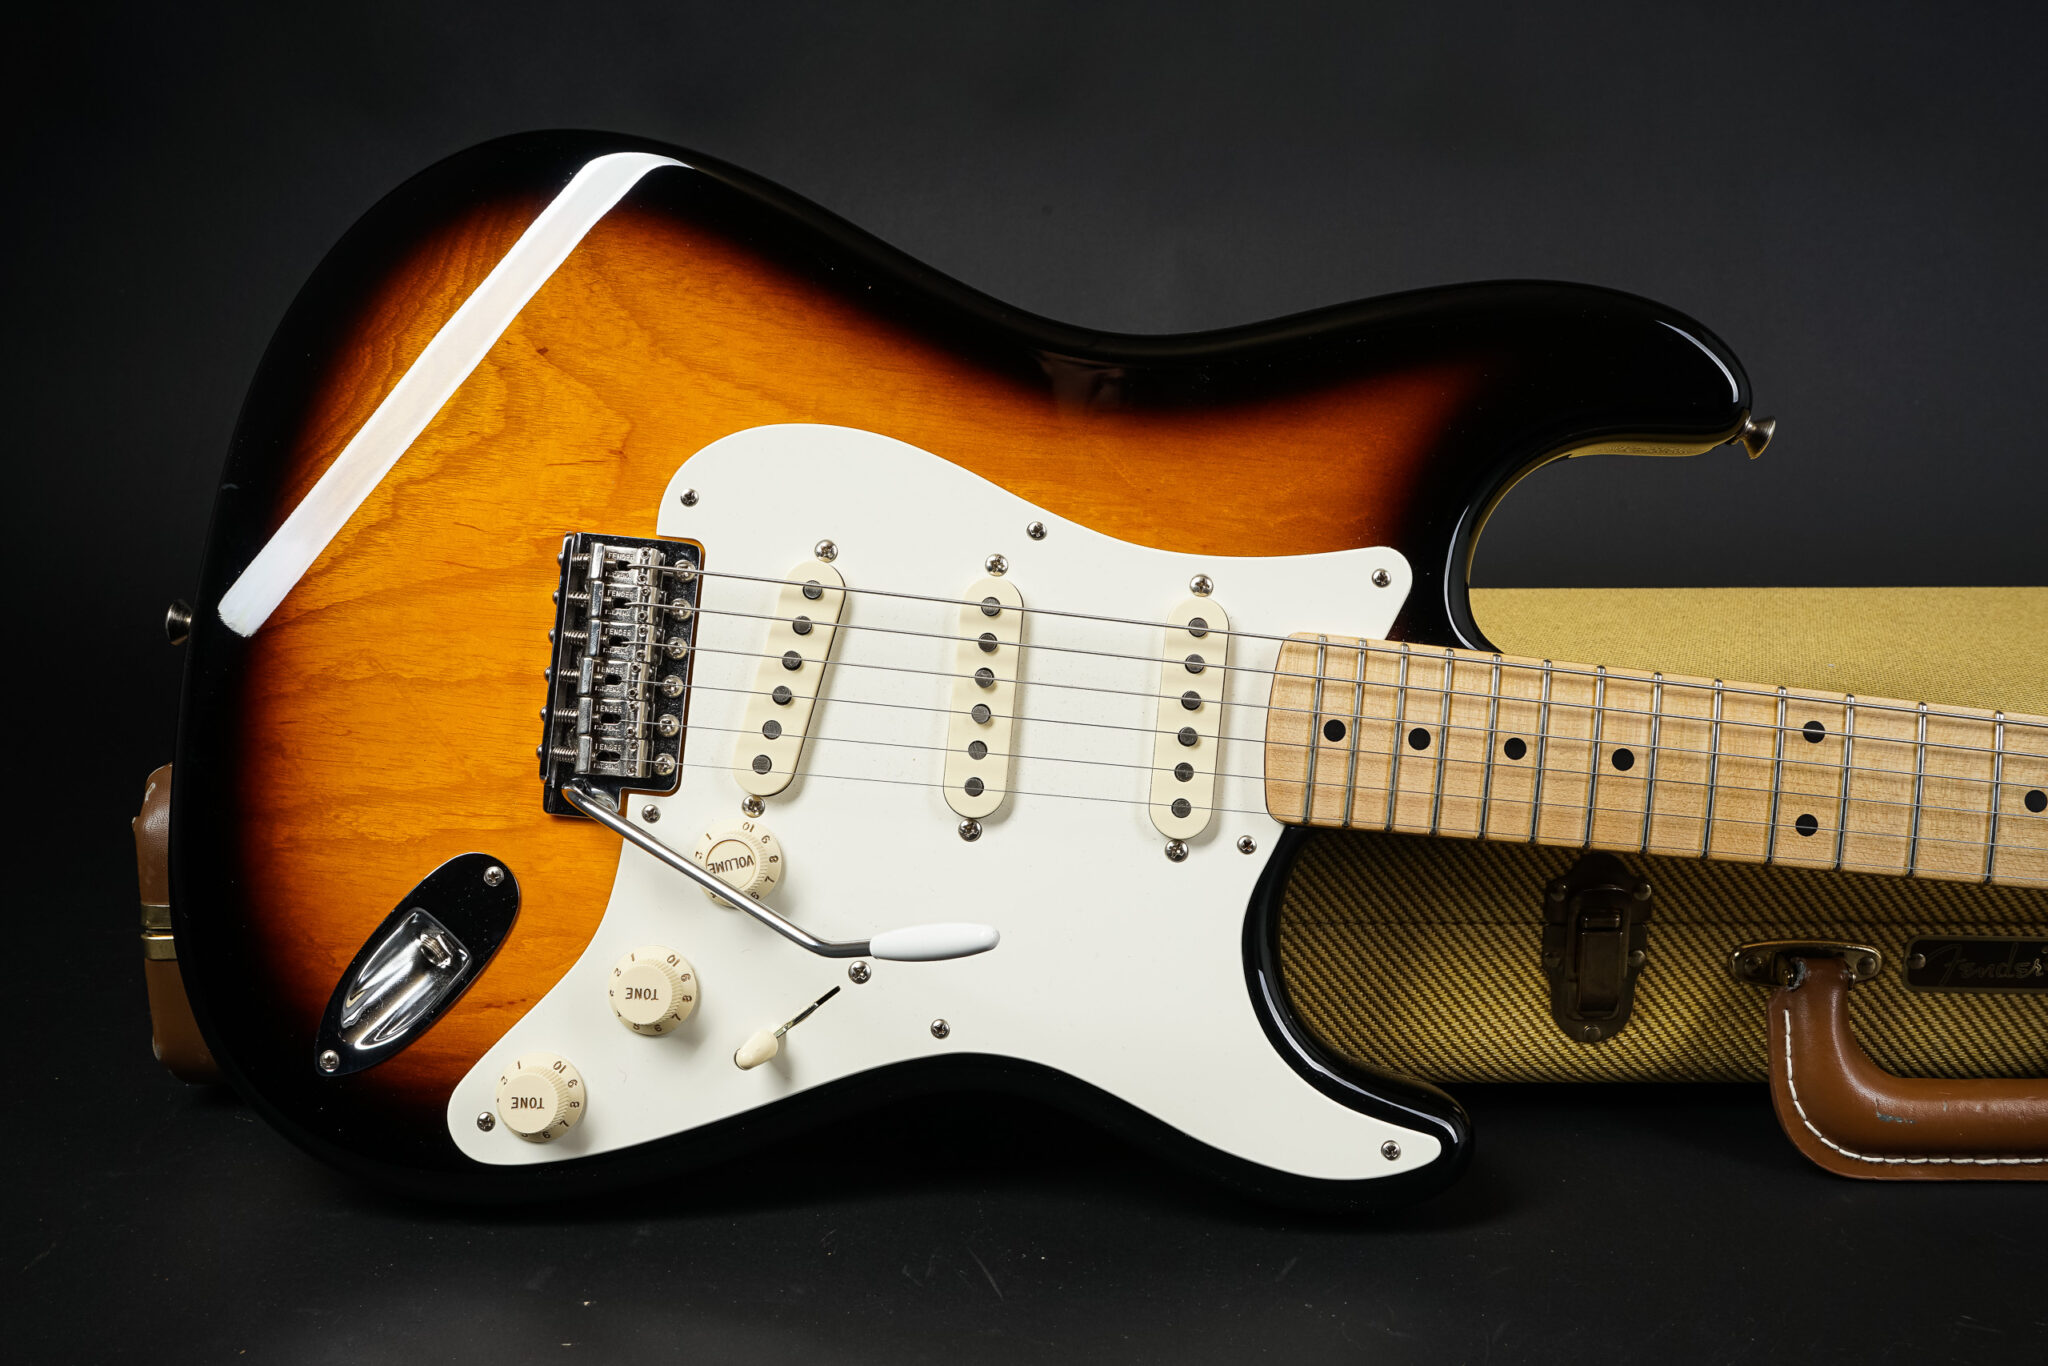 https://guitarpoint.de/app/uploads/products/2014-fender-john-cruz-masterbuilt-master-vintage-player-56-stratocaster-nos/Fender-John-Cruz-Masterbuilt-Master-Vintage-Player-56-Stratocaster-NOS-JC2596-10-2048x1366.jpg